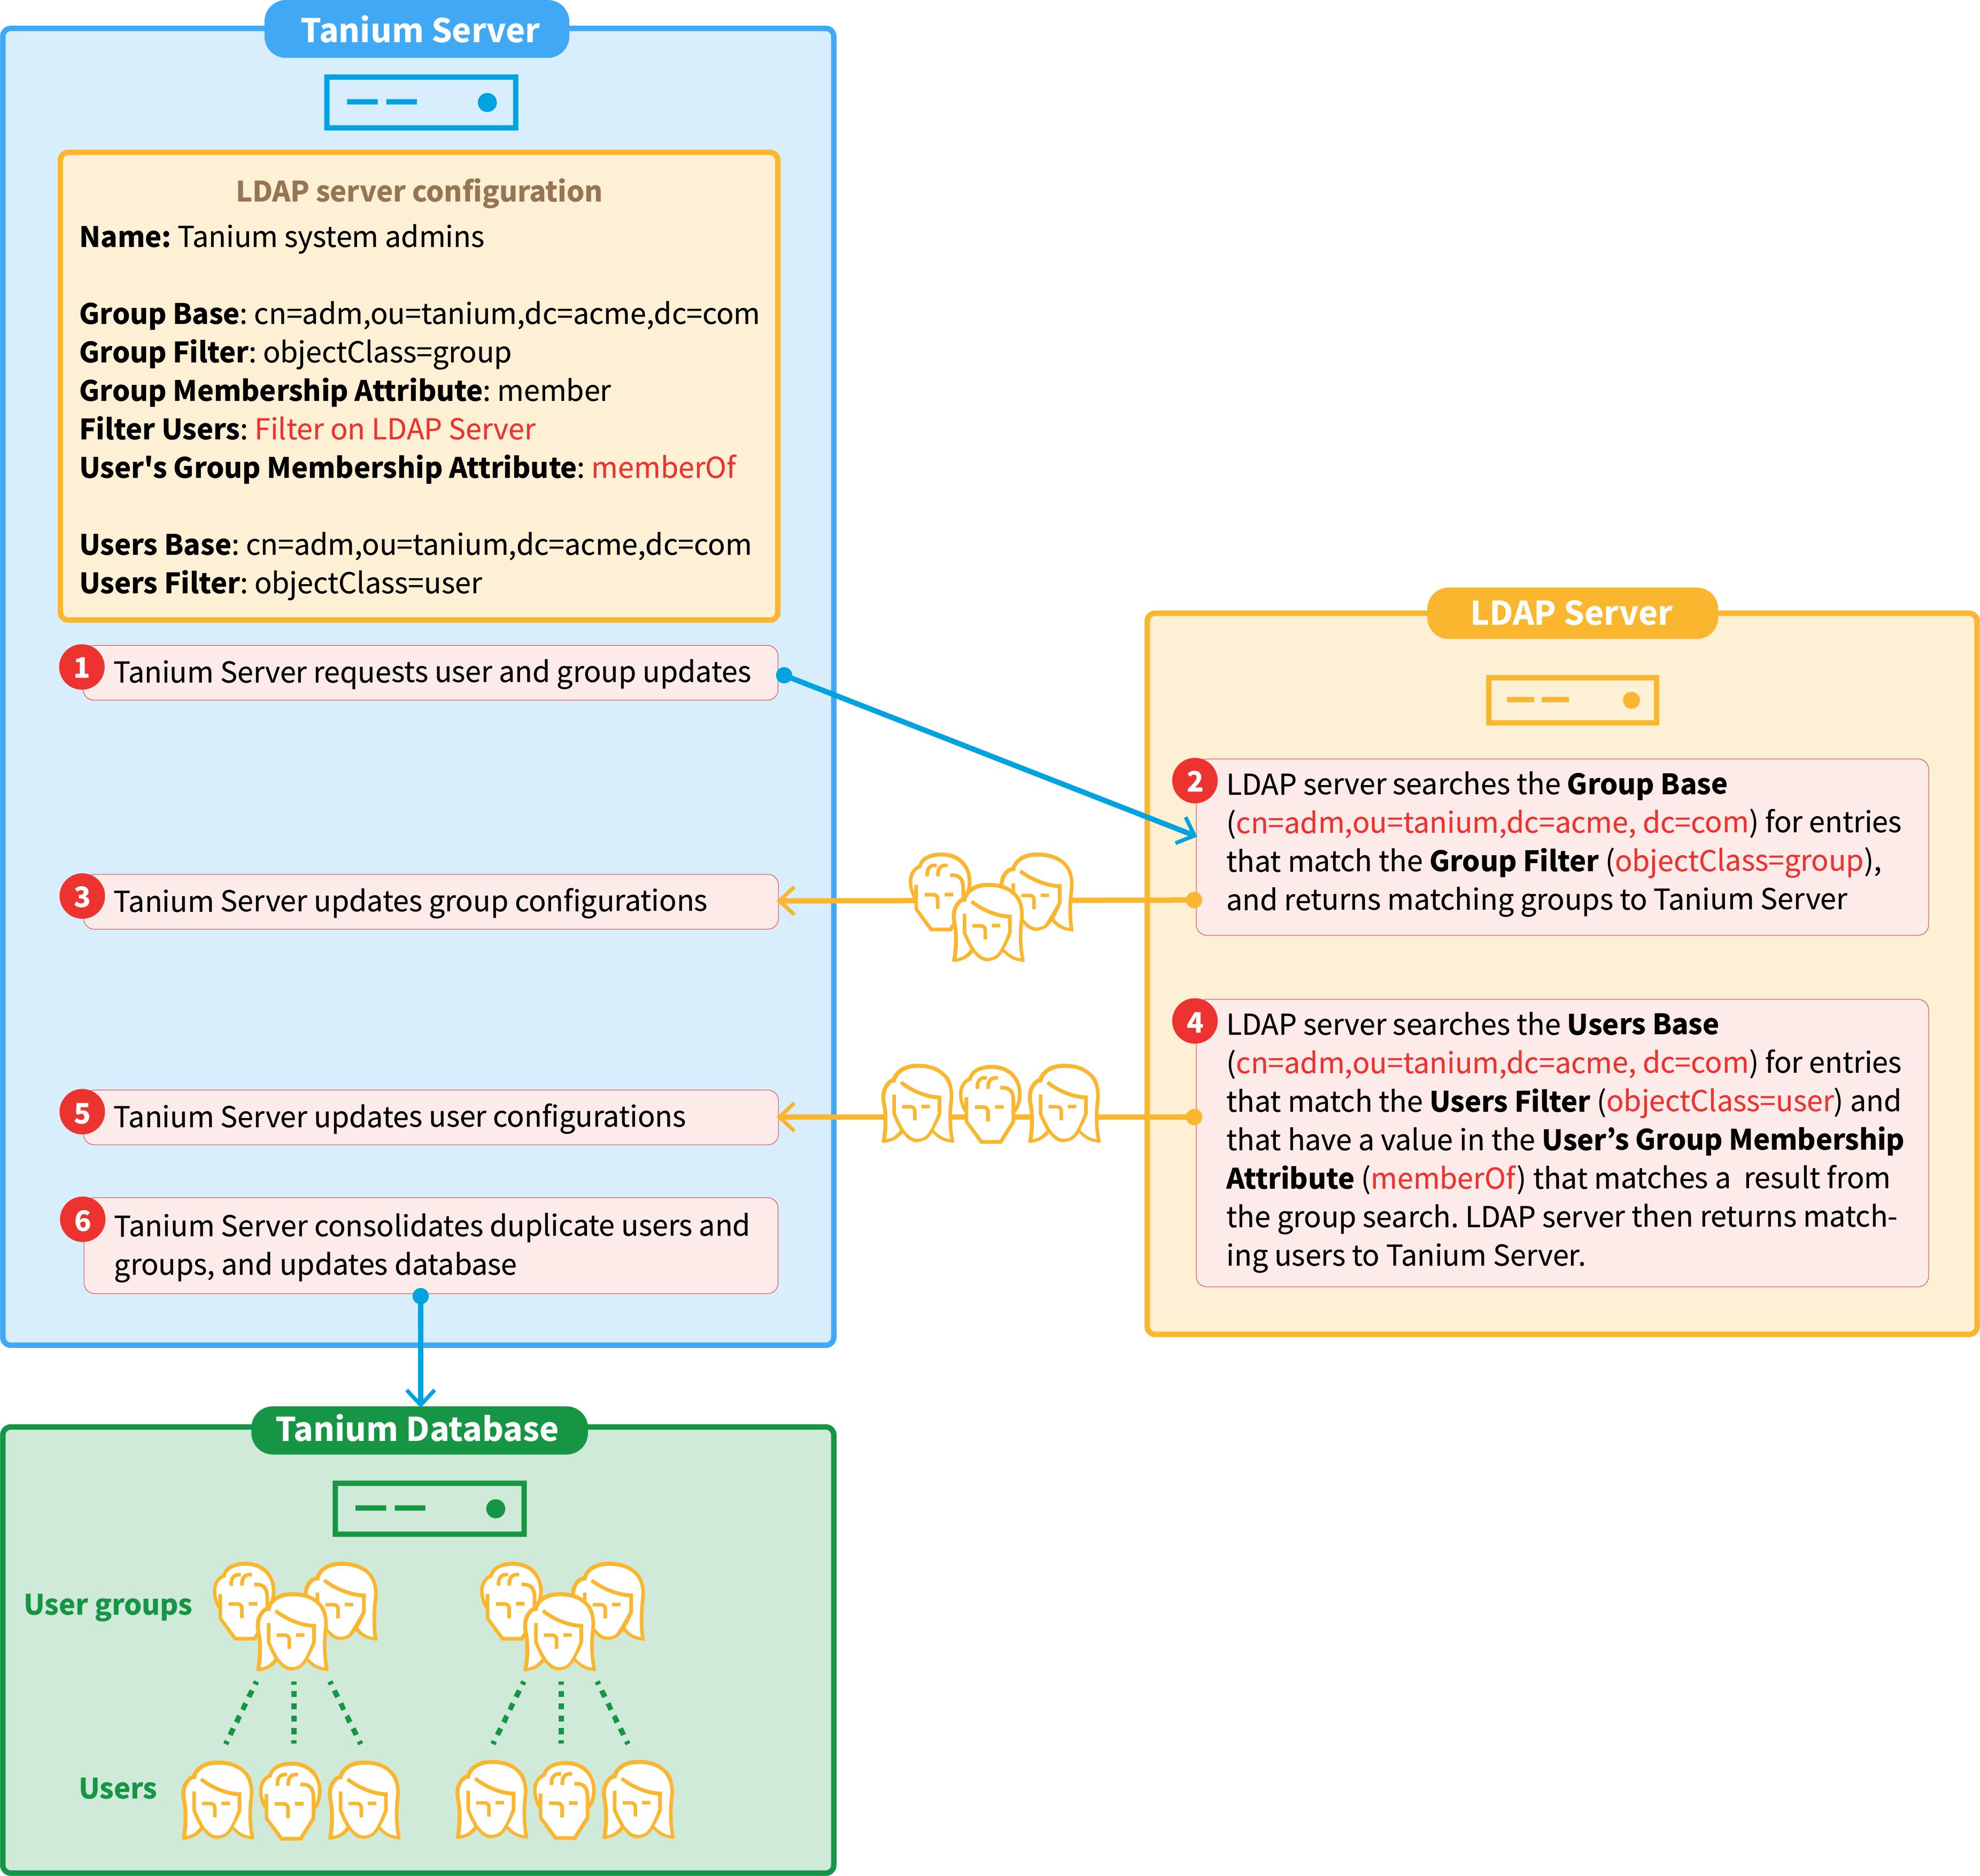 Integrating with LDAP servers